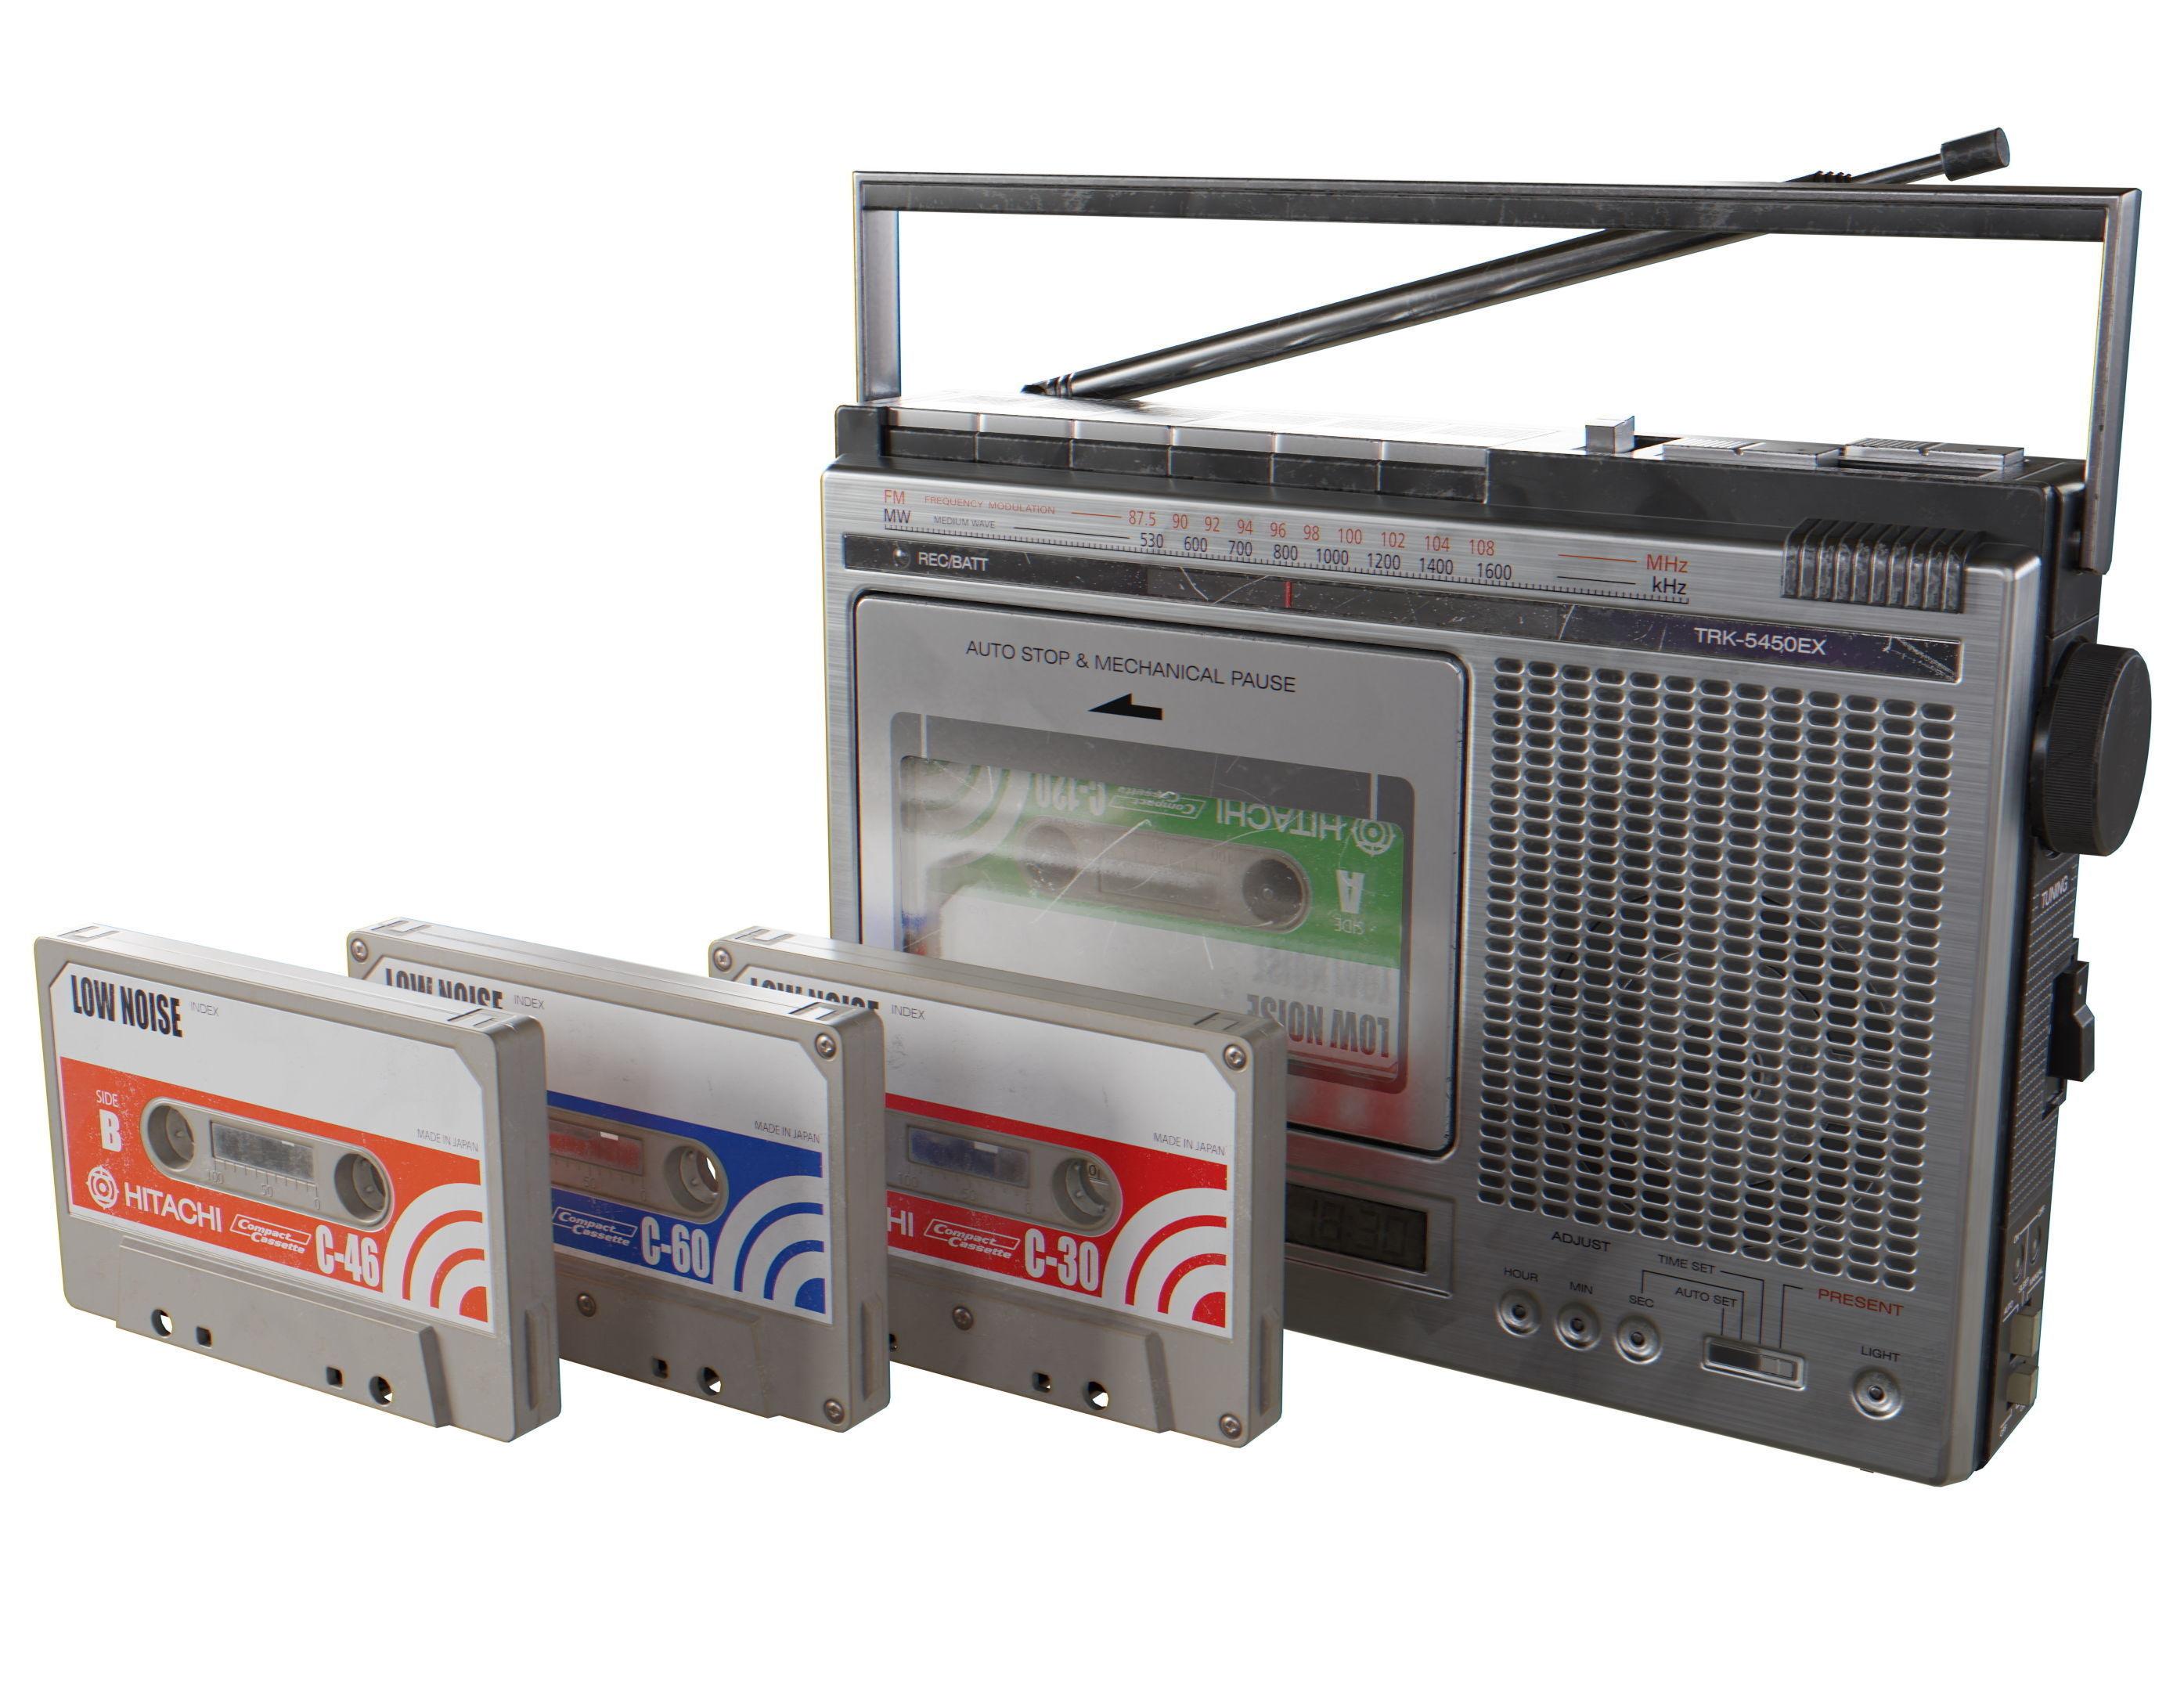 HITACHI TRK-5450EX Cassette Recorder